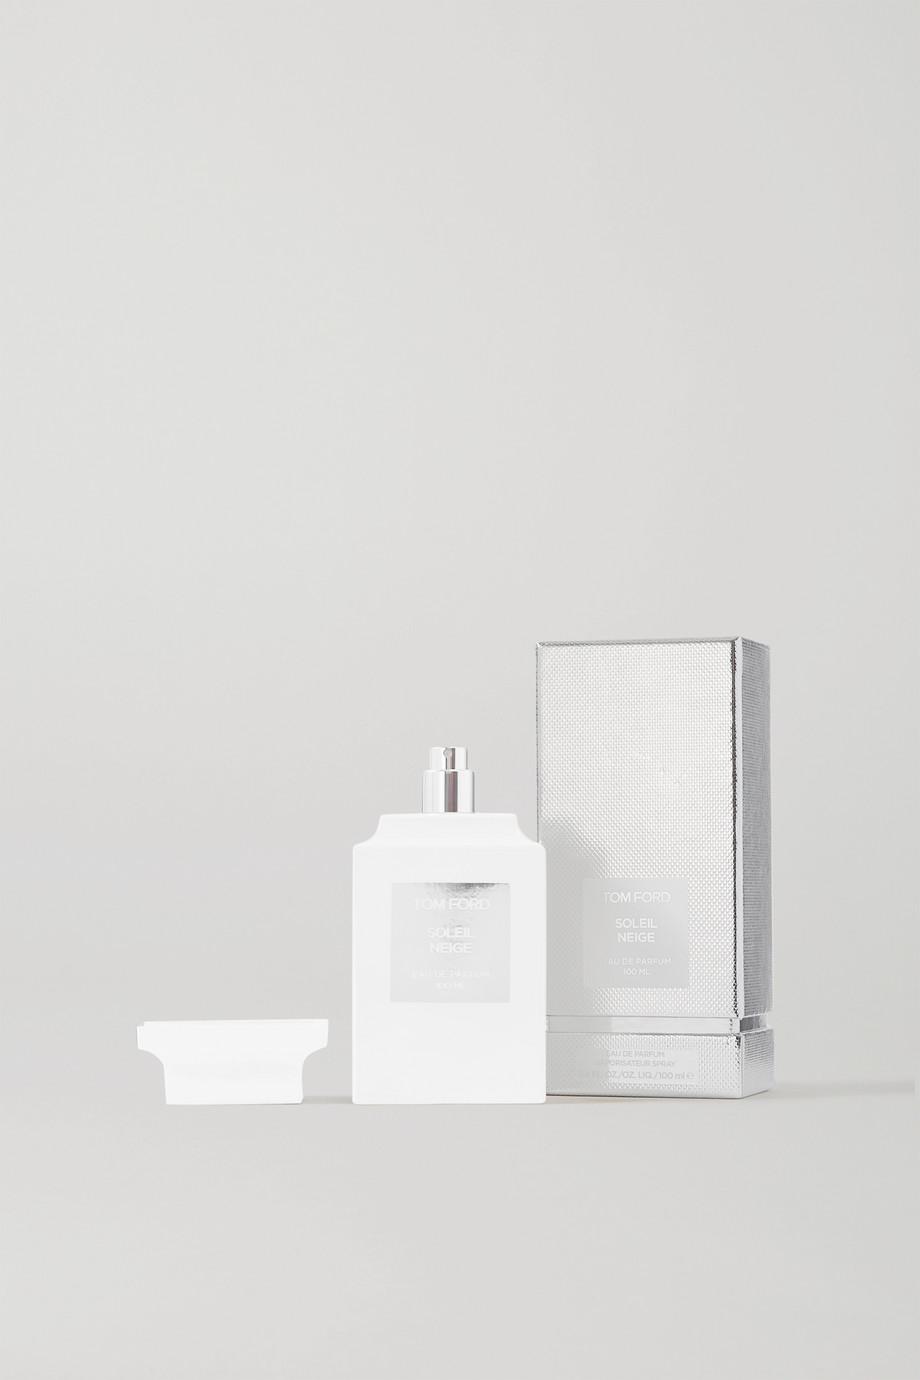 TOM FORD BEAUTY Eau de Parfum - Soleil Neige, 100ml